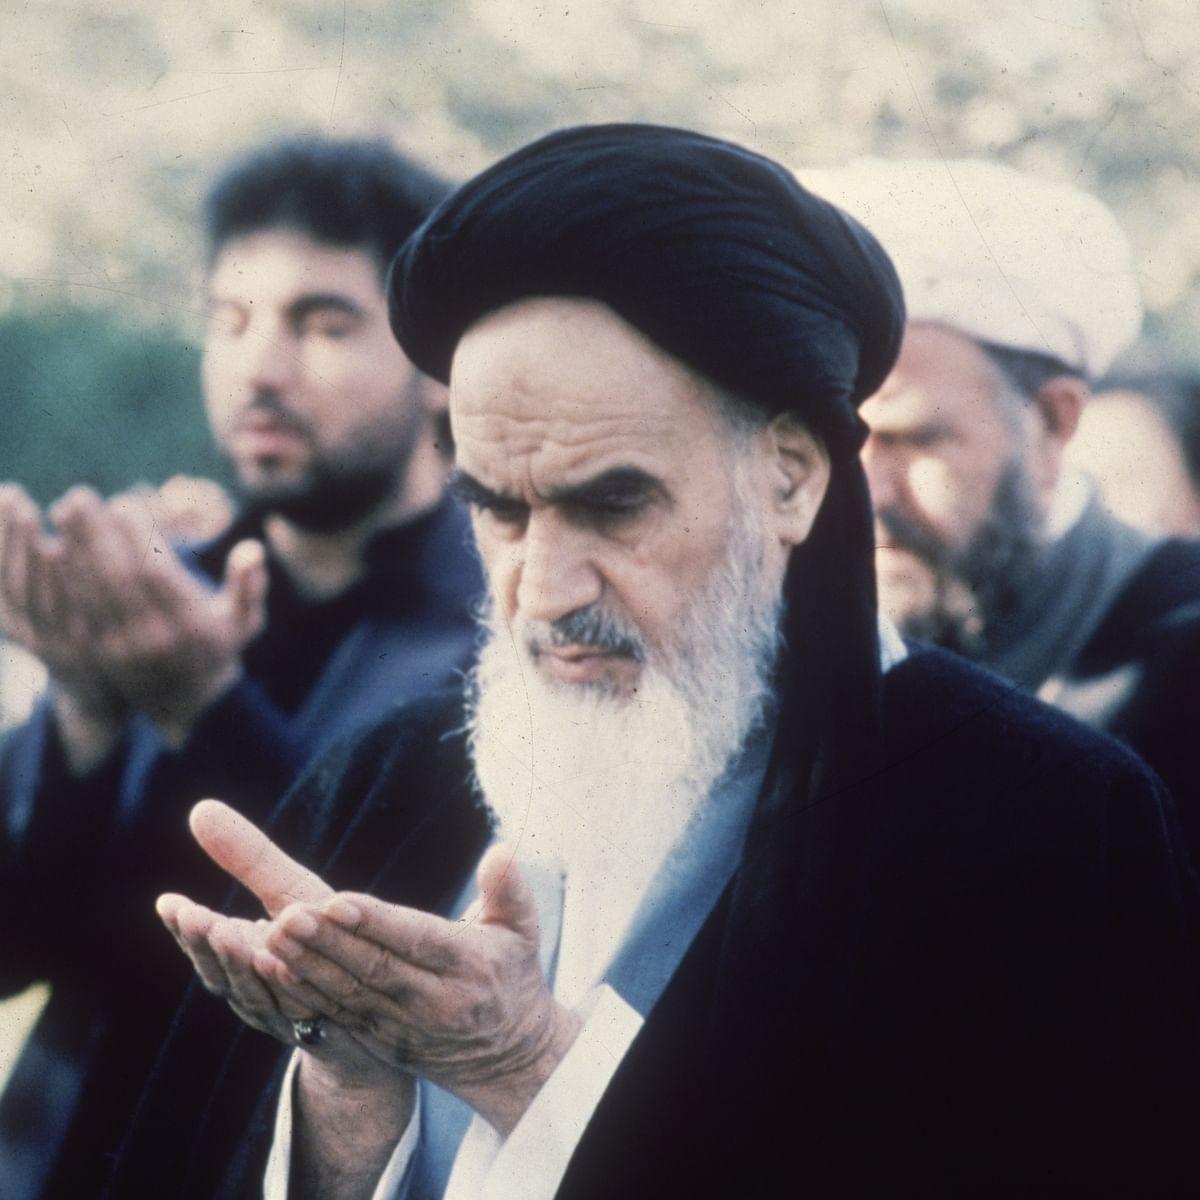 امام خمینی / Getty Images